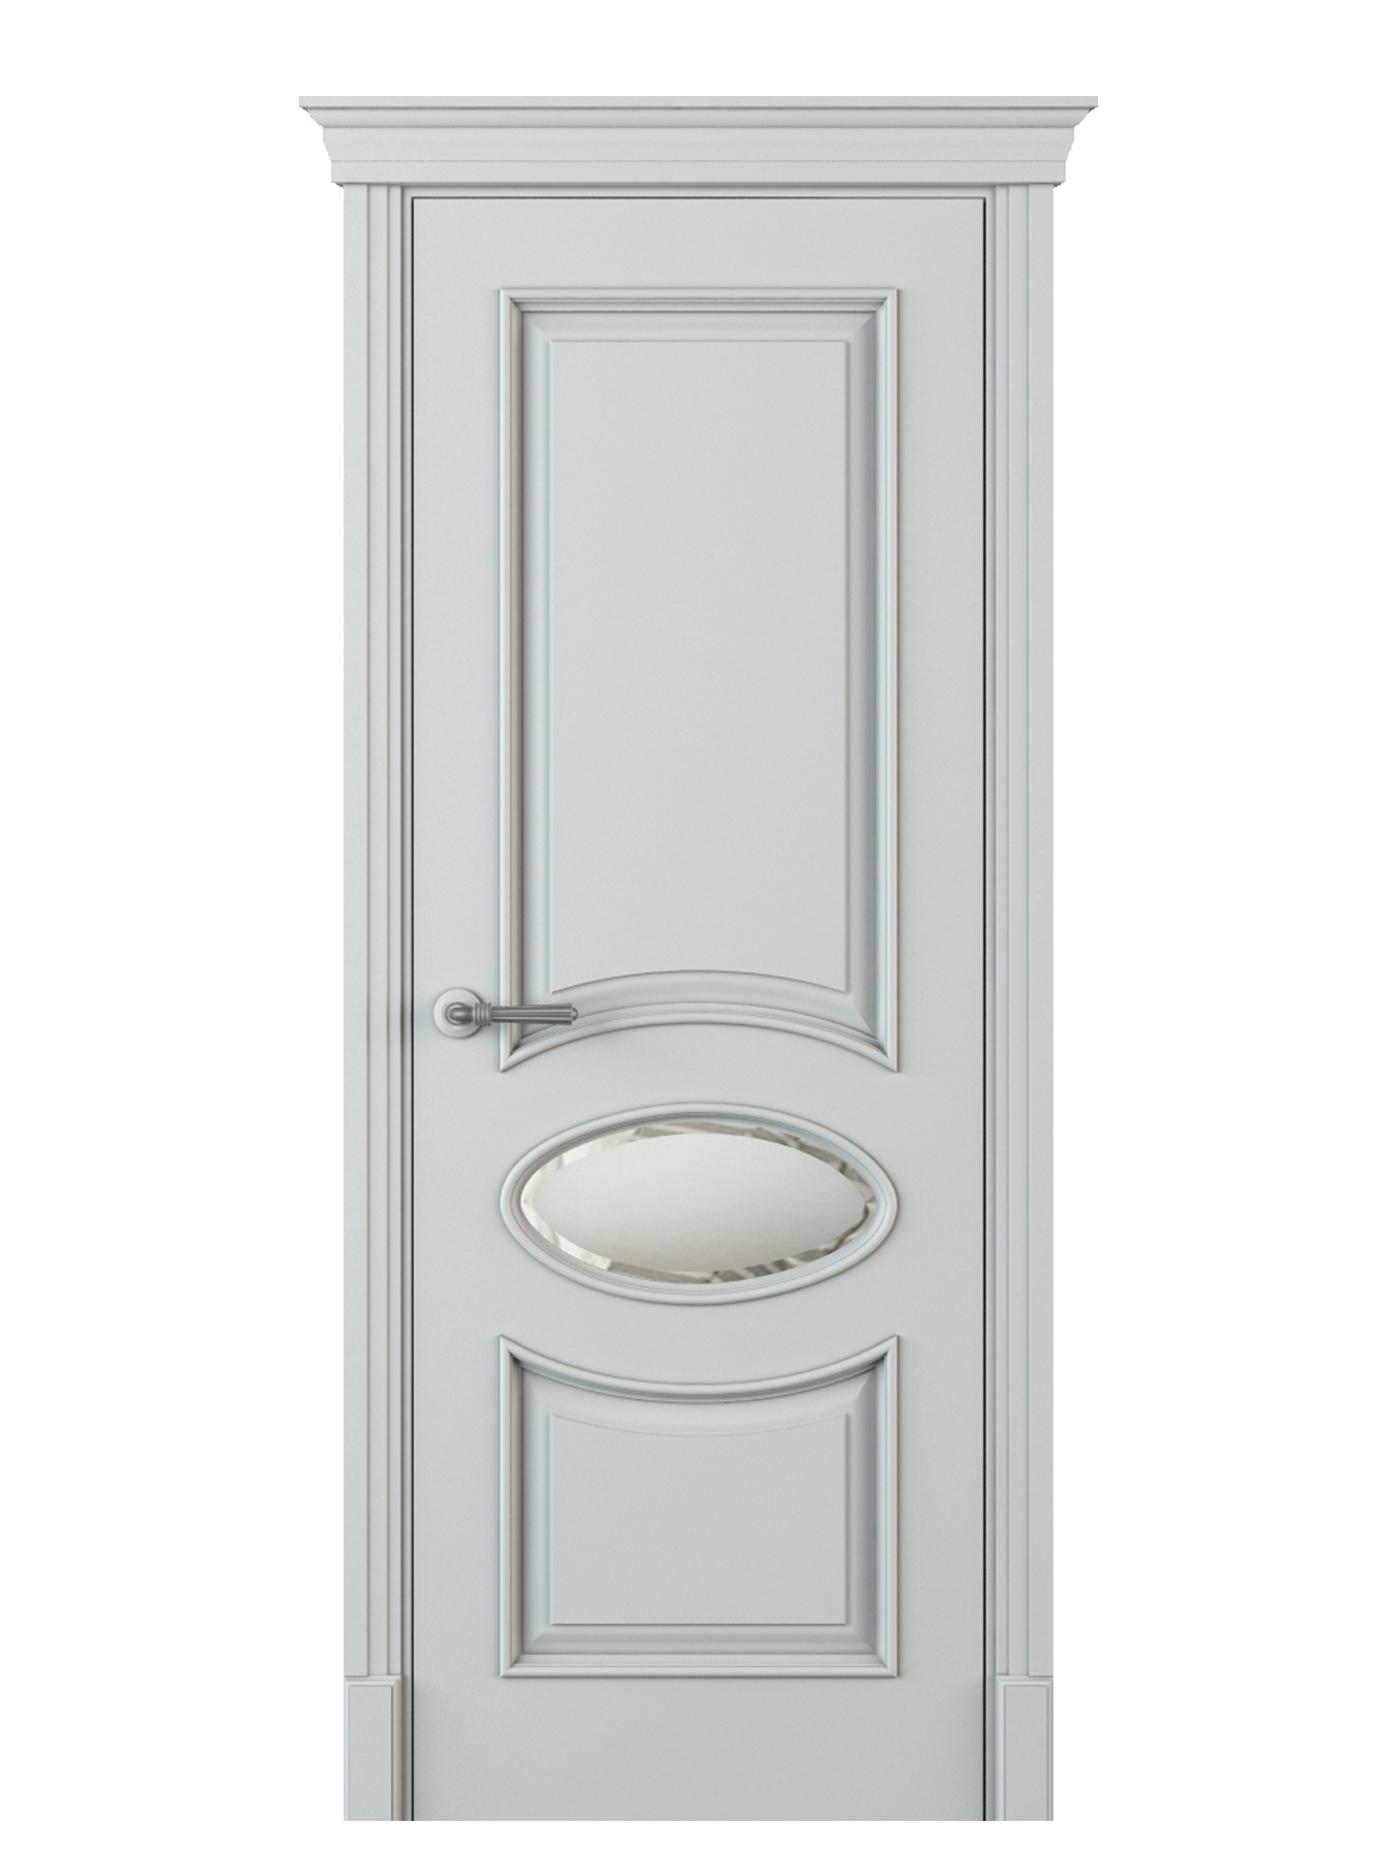 Image Formazza Inserto Interior Door Italian Enamel 7035 0